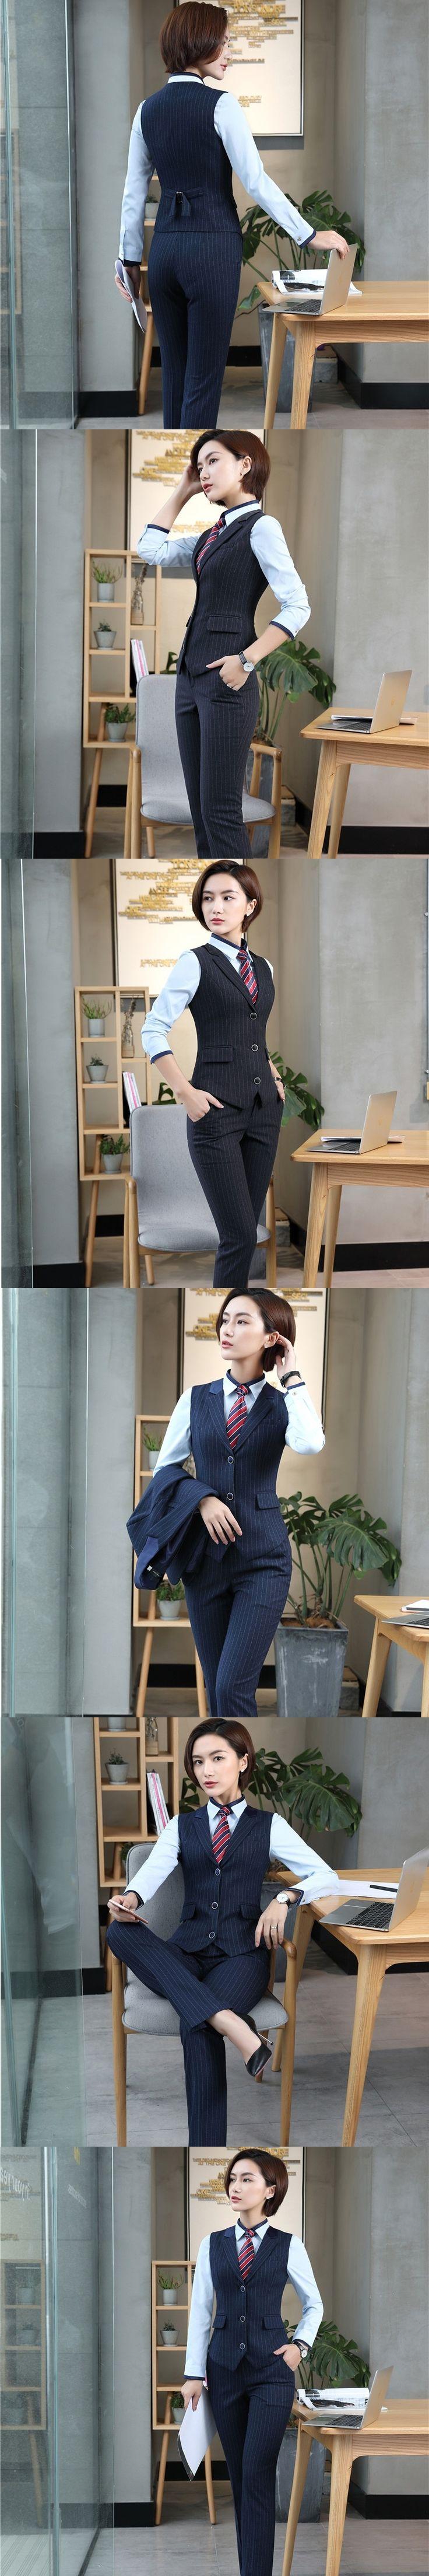 Formal Uniform Design Pantsuits Fashion Striped With 2 Piece Vest Coat and Pants For Ladies Women Business Outfits Plus Size